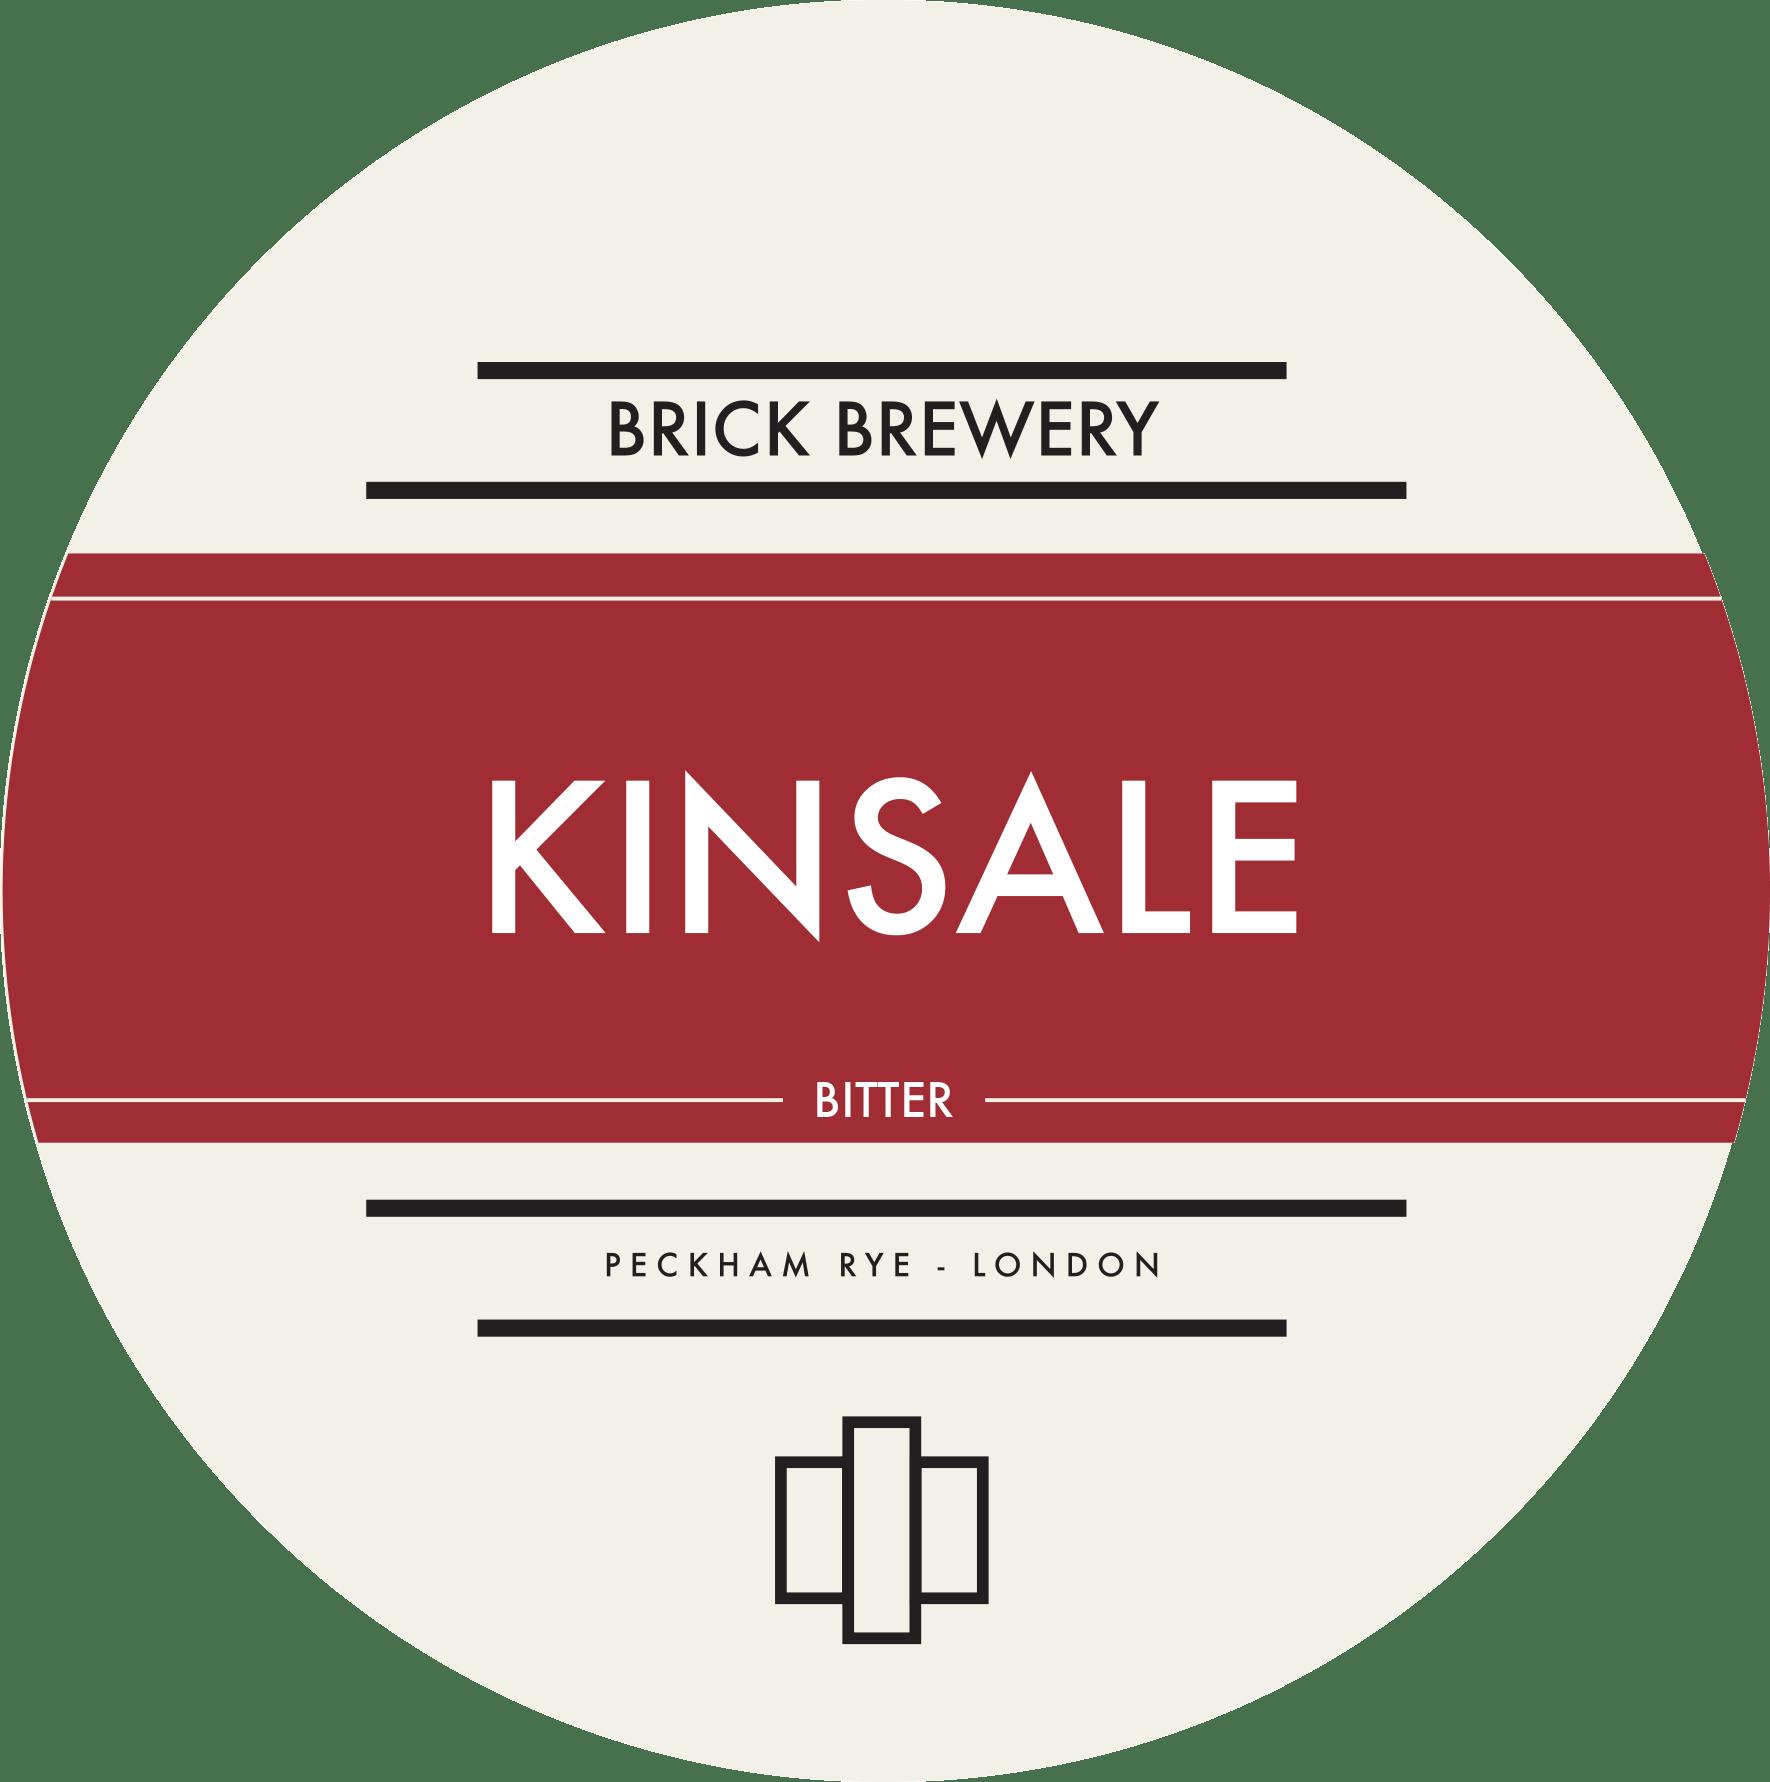 Brick Brewery's Kinsale Best Bitter Logo